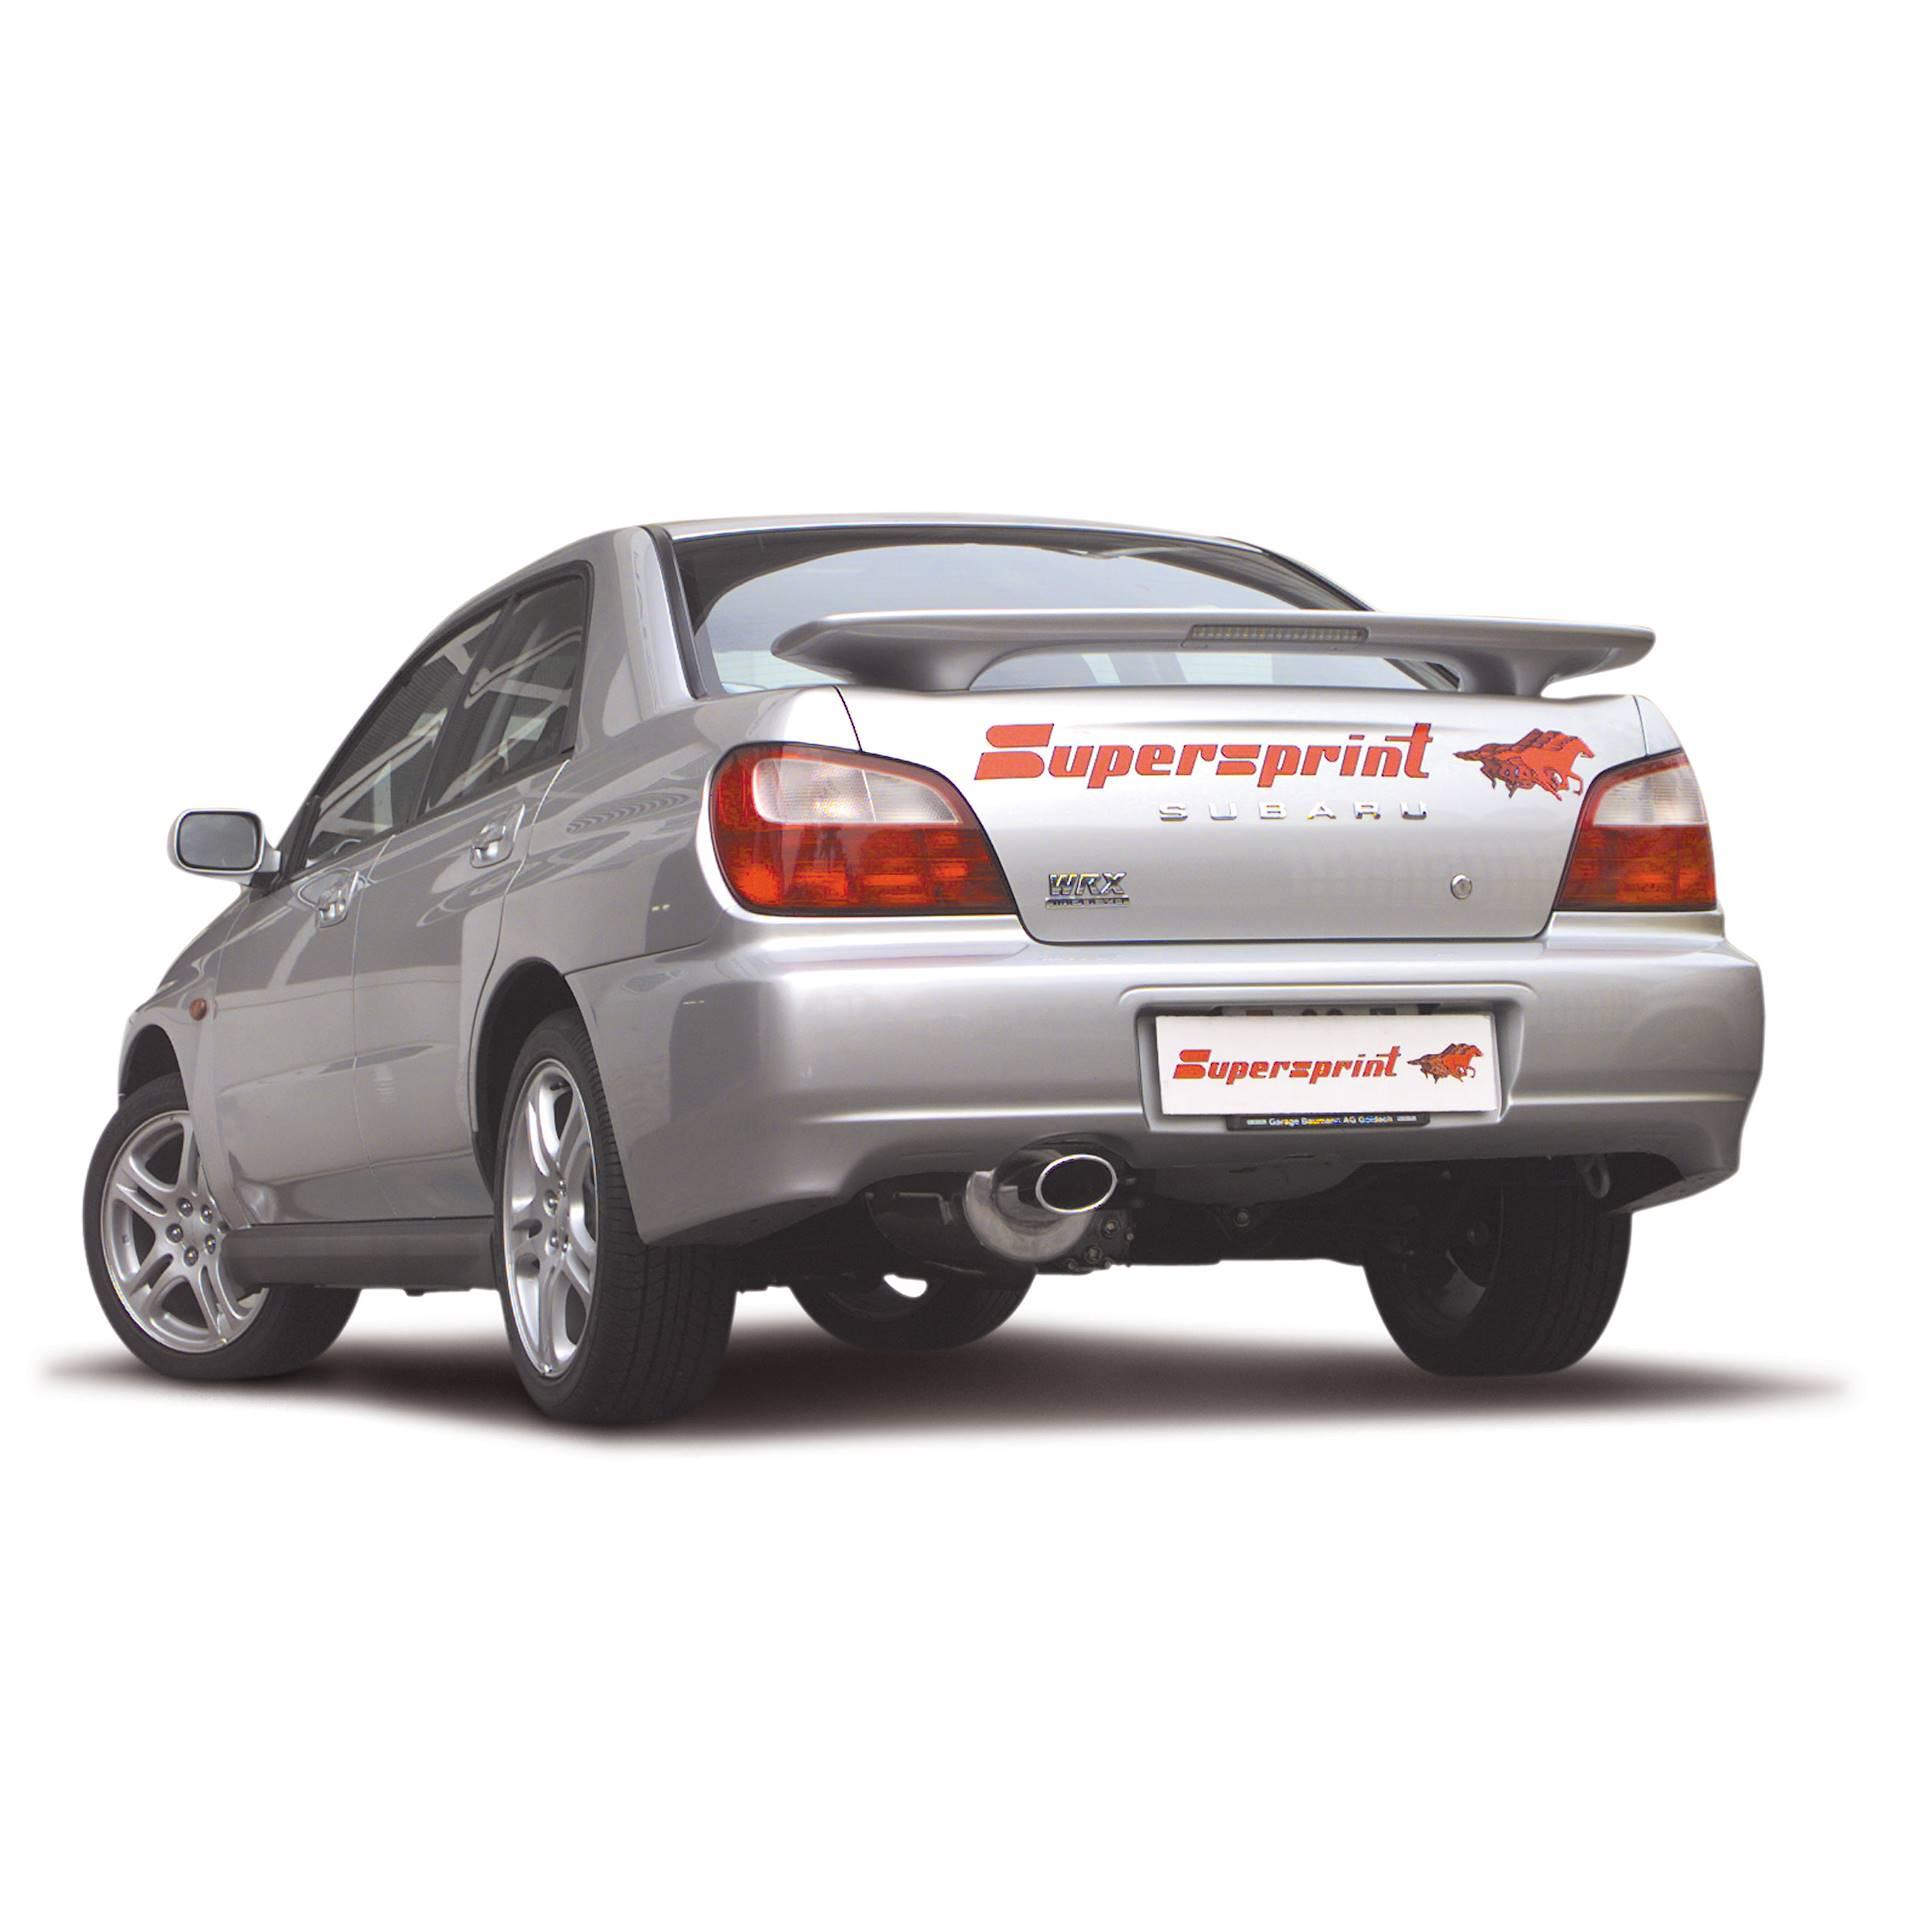 SUBARU IMPREZA 4WD 2.0i WRX (218 Hp) (4d.+Compact Wagon